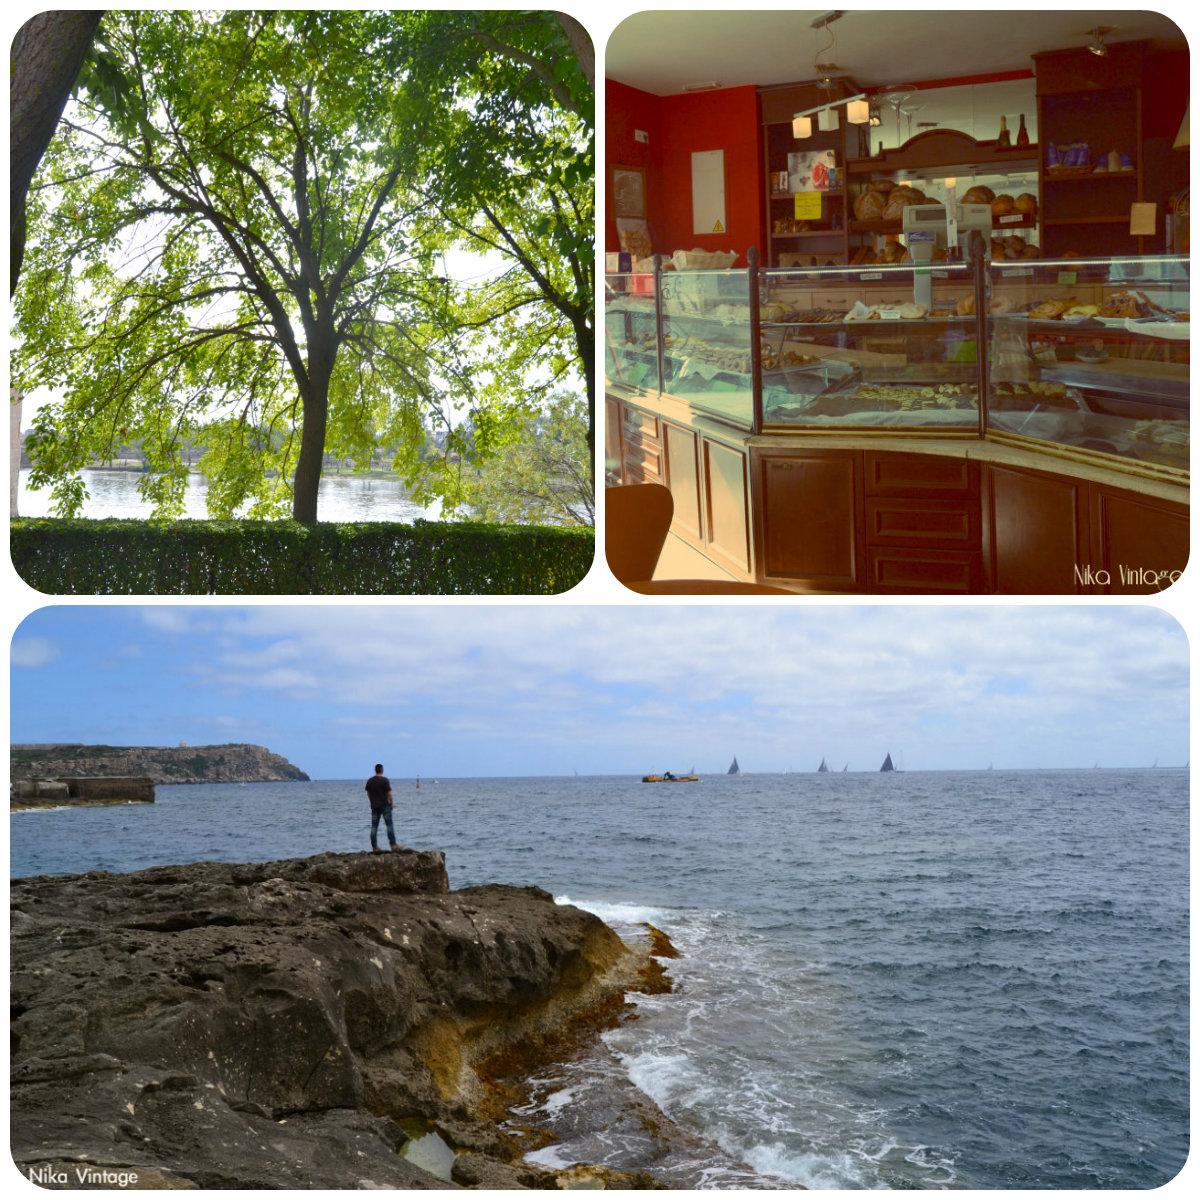 lugares especiales, zamora, menorca, fotografia, monumentos, regata maxi menorca, cafe teatro, olivares